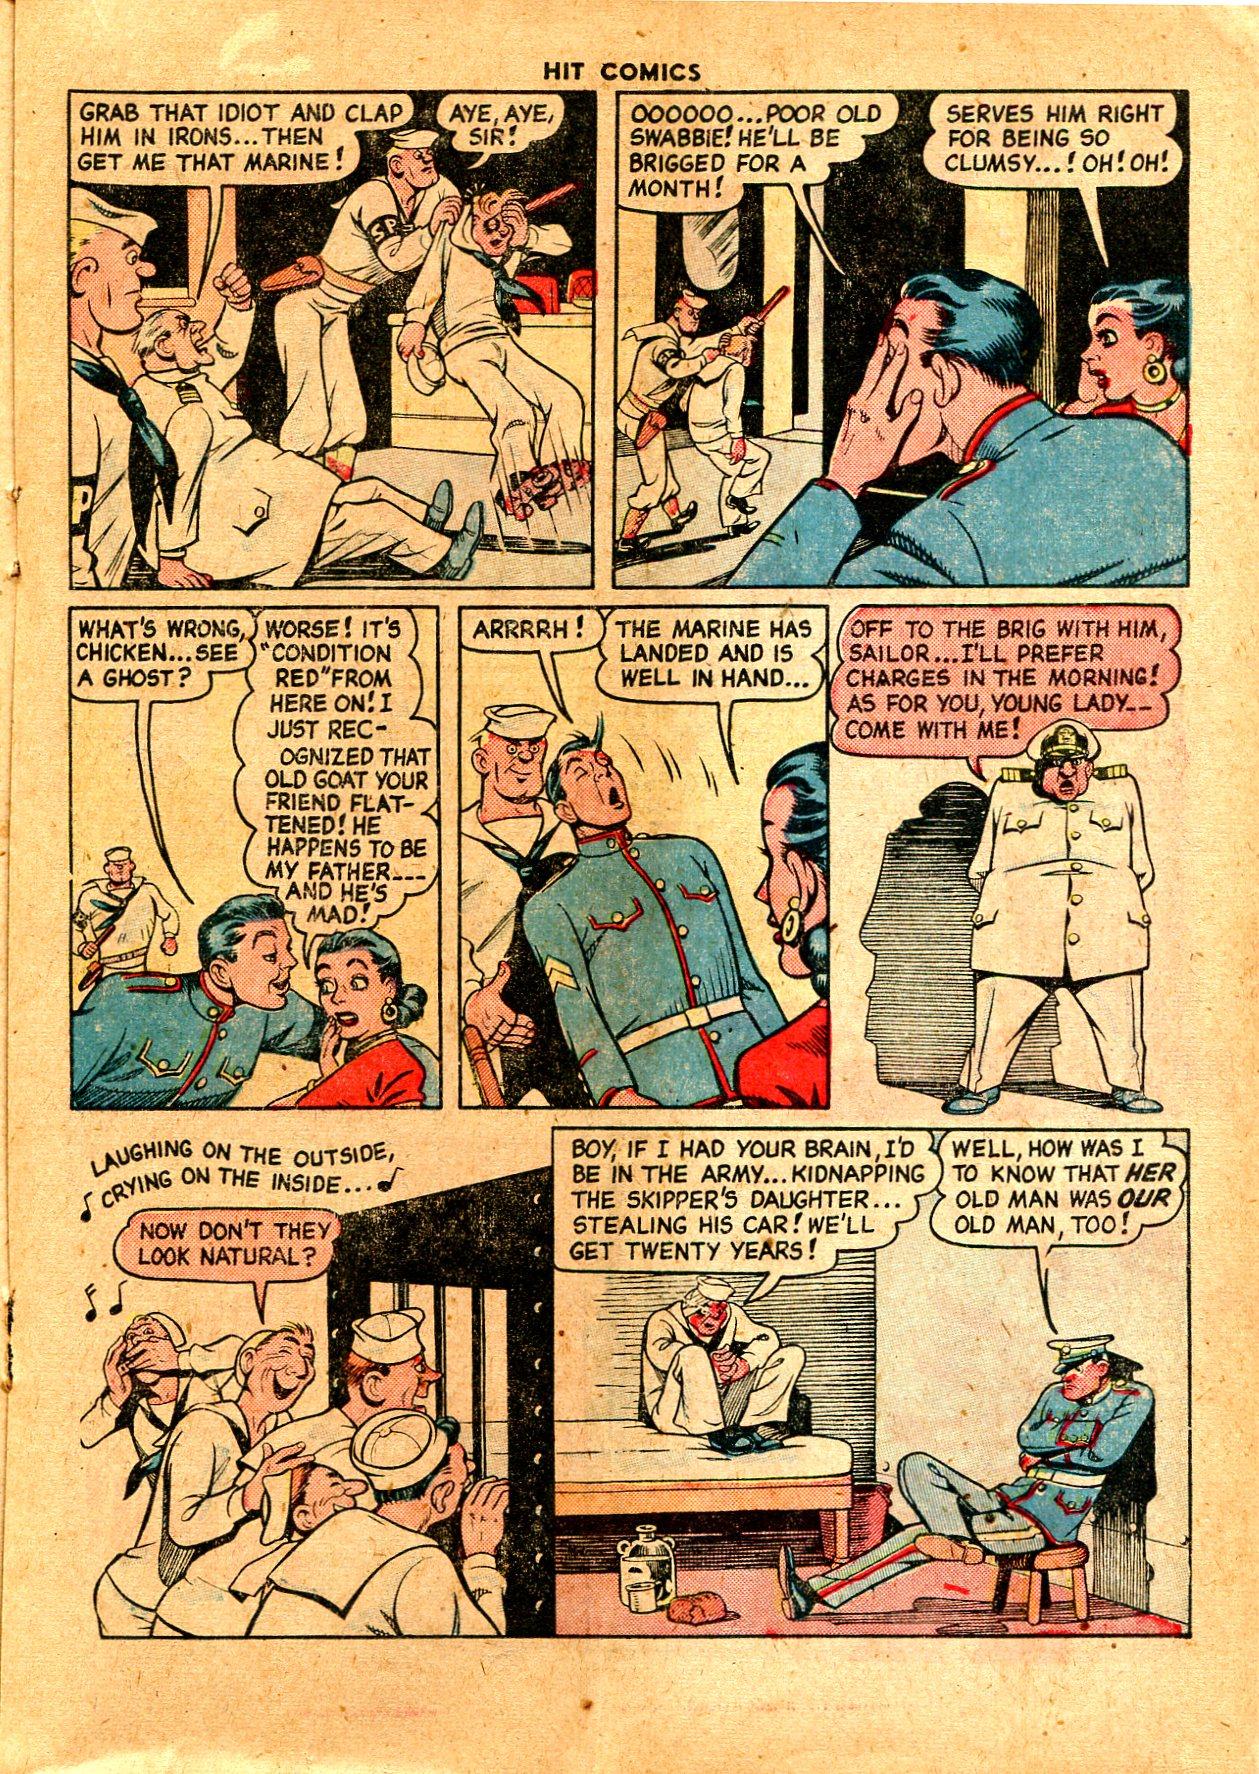 Read online Hit Comics comic -  Issue #57 - 25